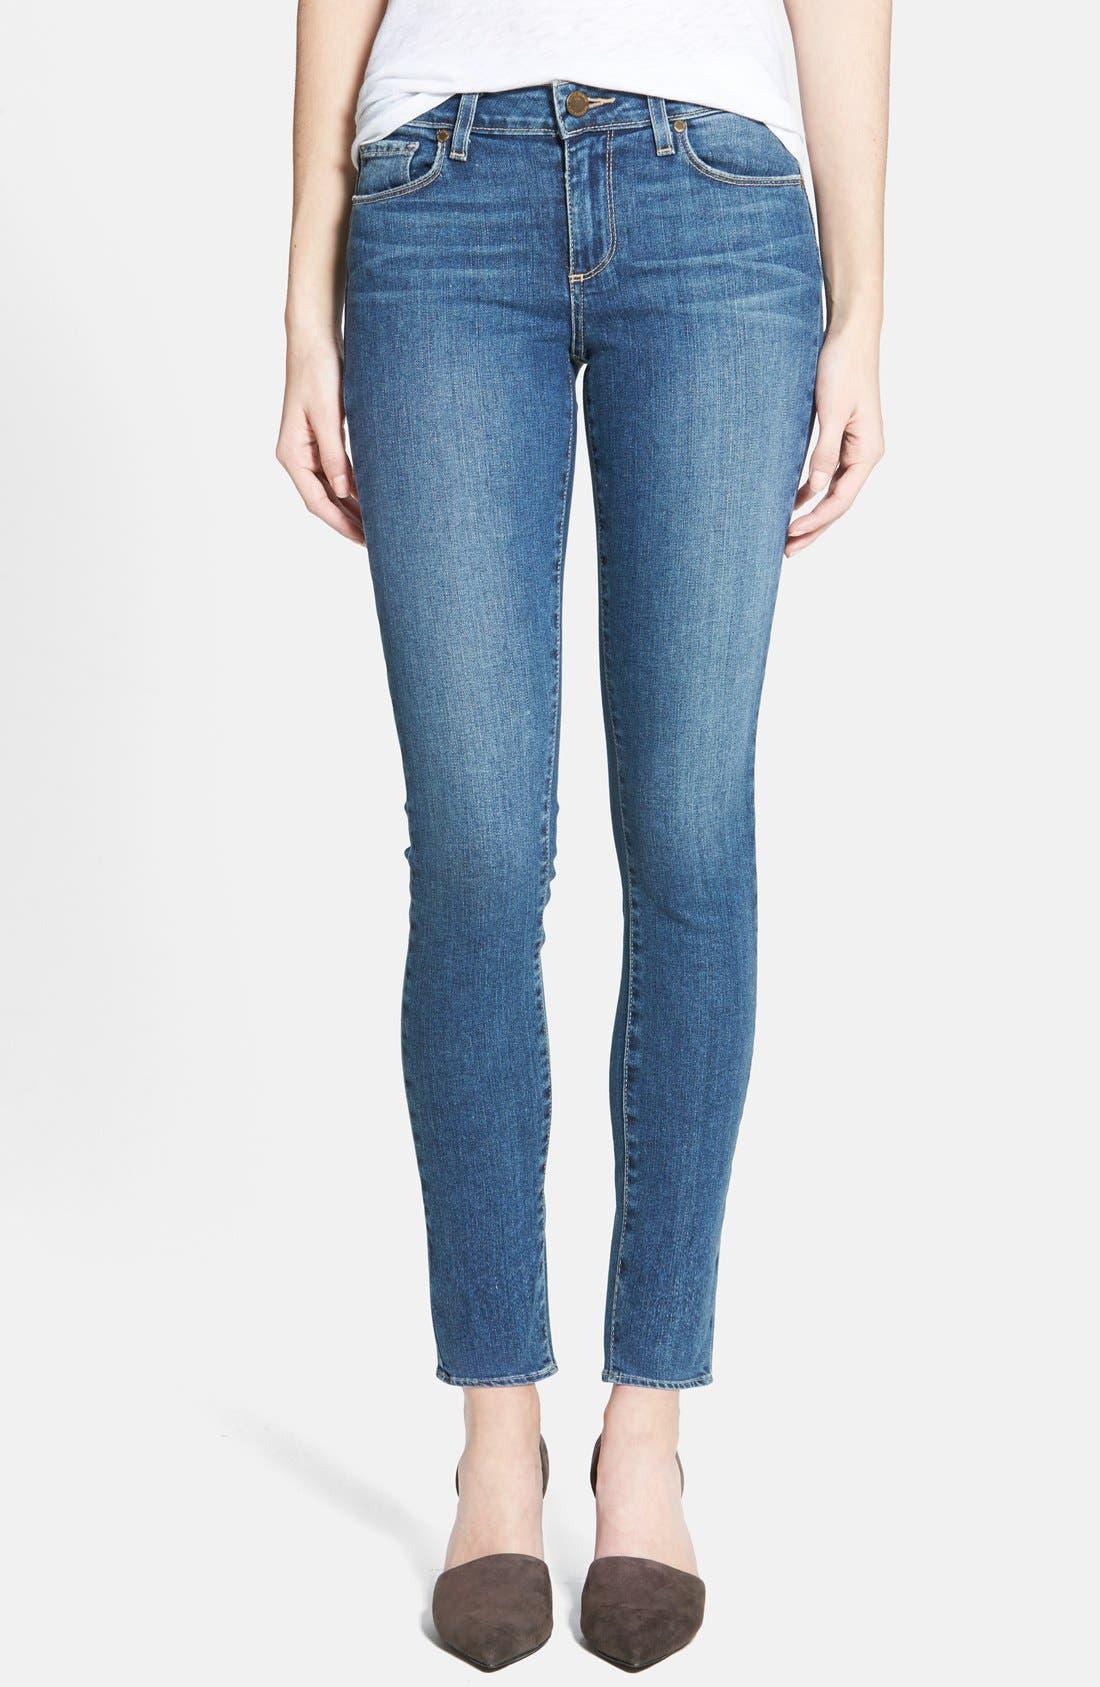 Alternate Image 1 Selected - Paige Denim 'Verdugo' Ultra Skinny Jeans (Miles Blue)